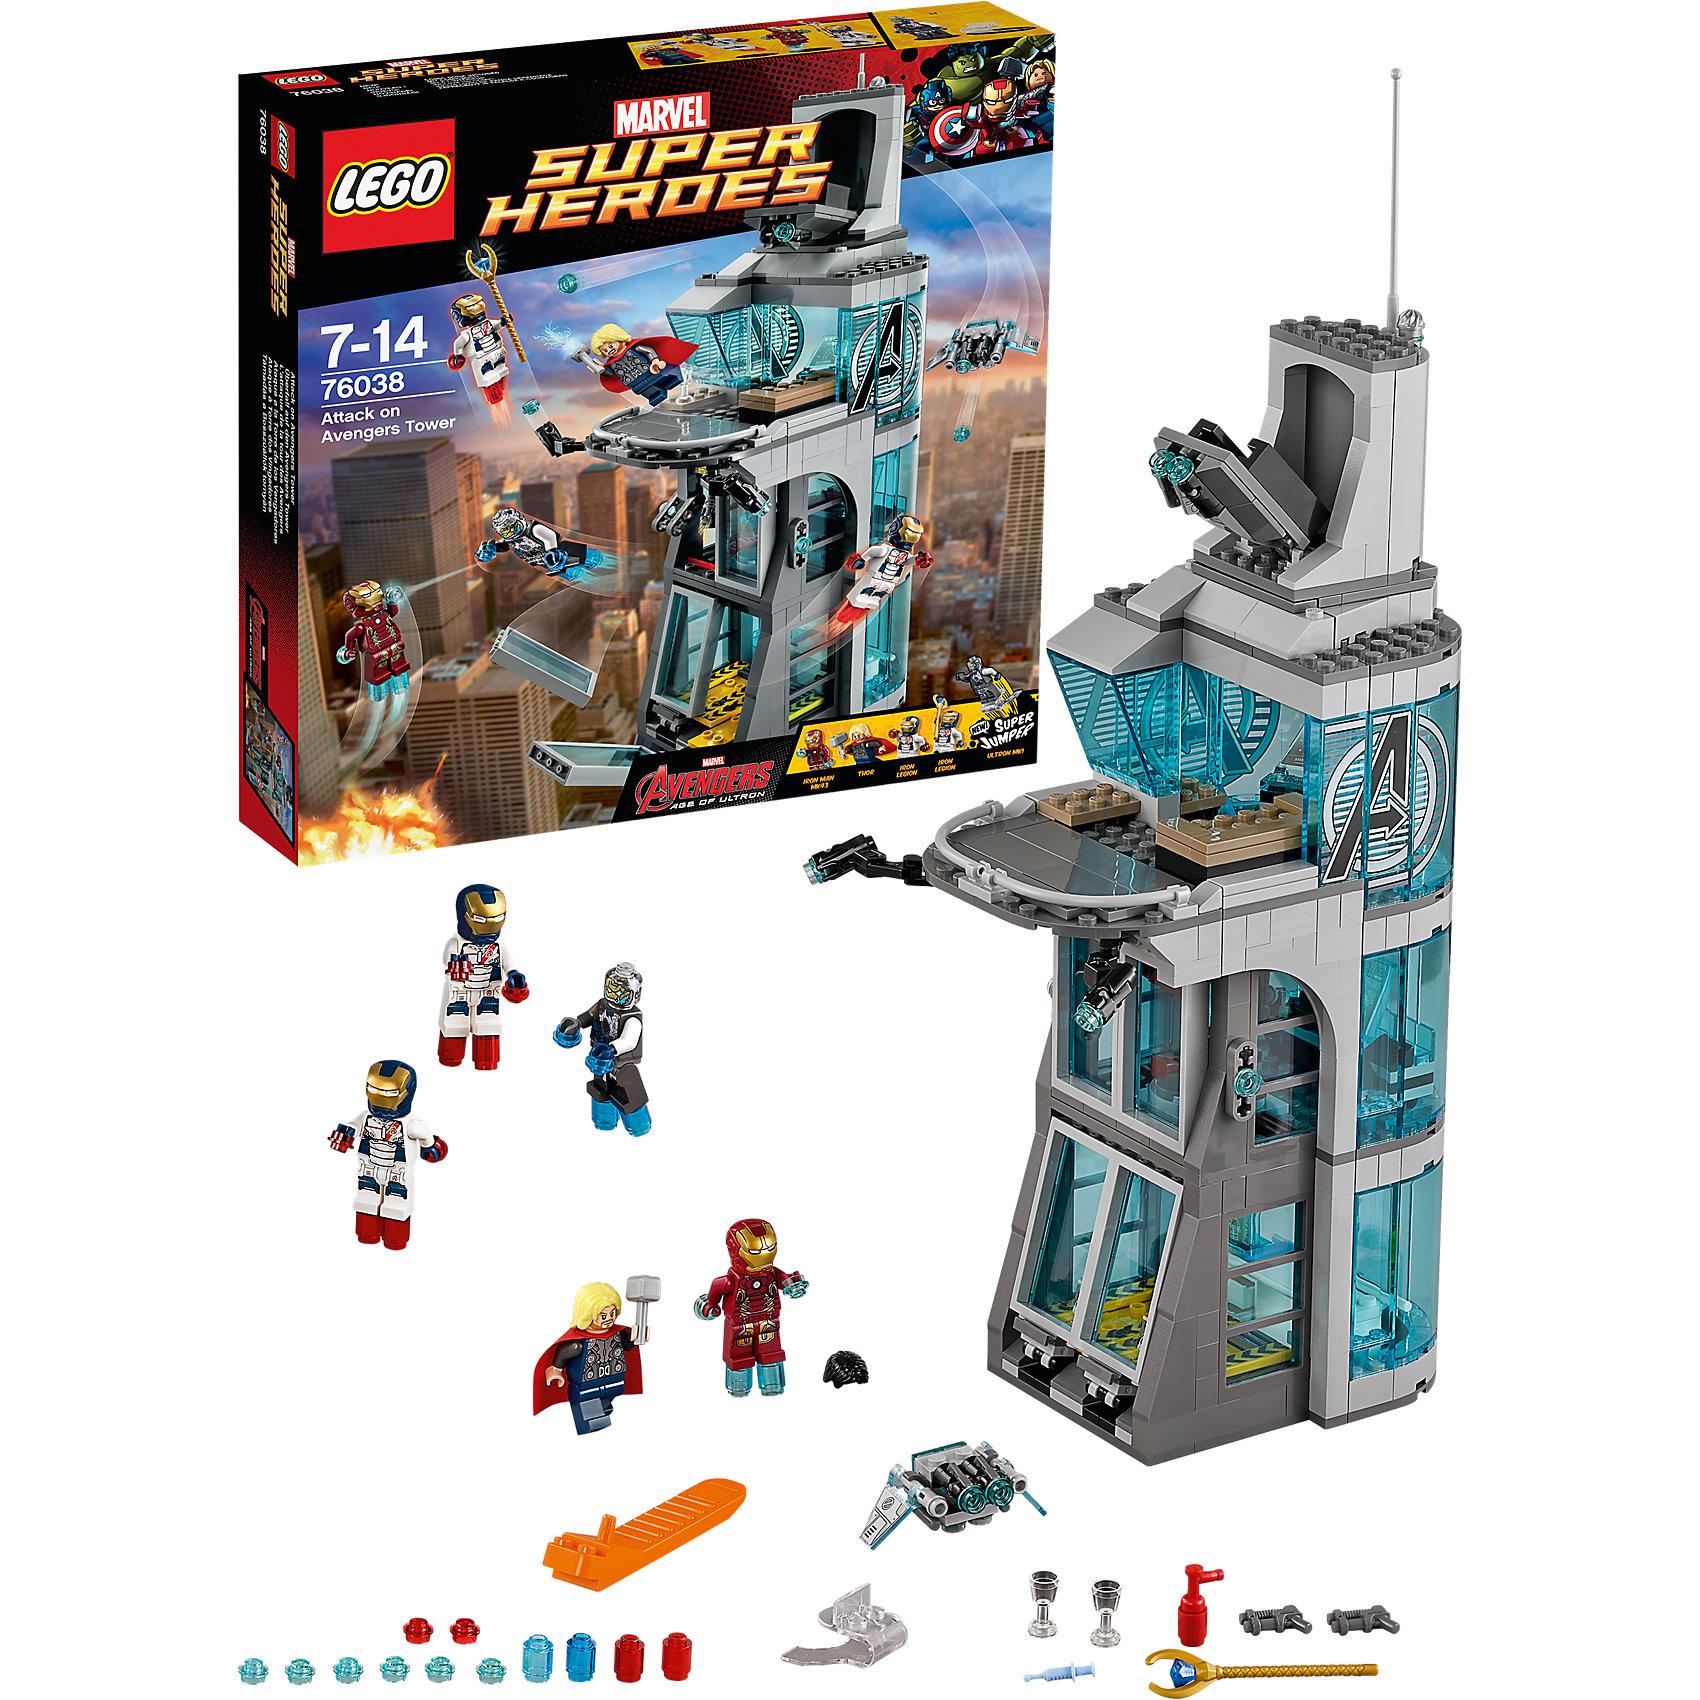 LEGO LEGO Super Heroes 76038: Нападение на башню Мстителей lego конструктор супер герои нападение на башню мстителей lego 76038